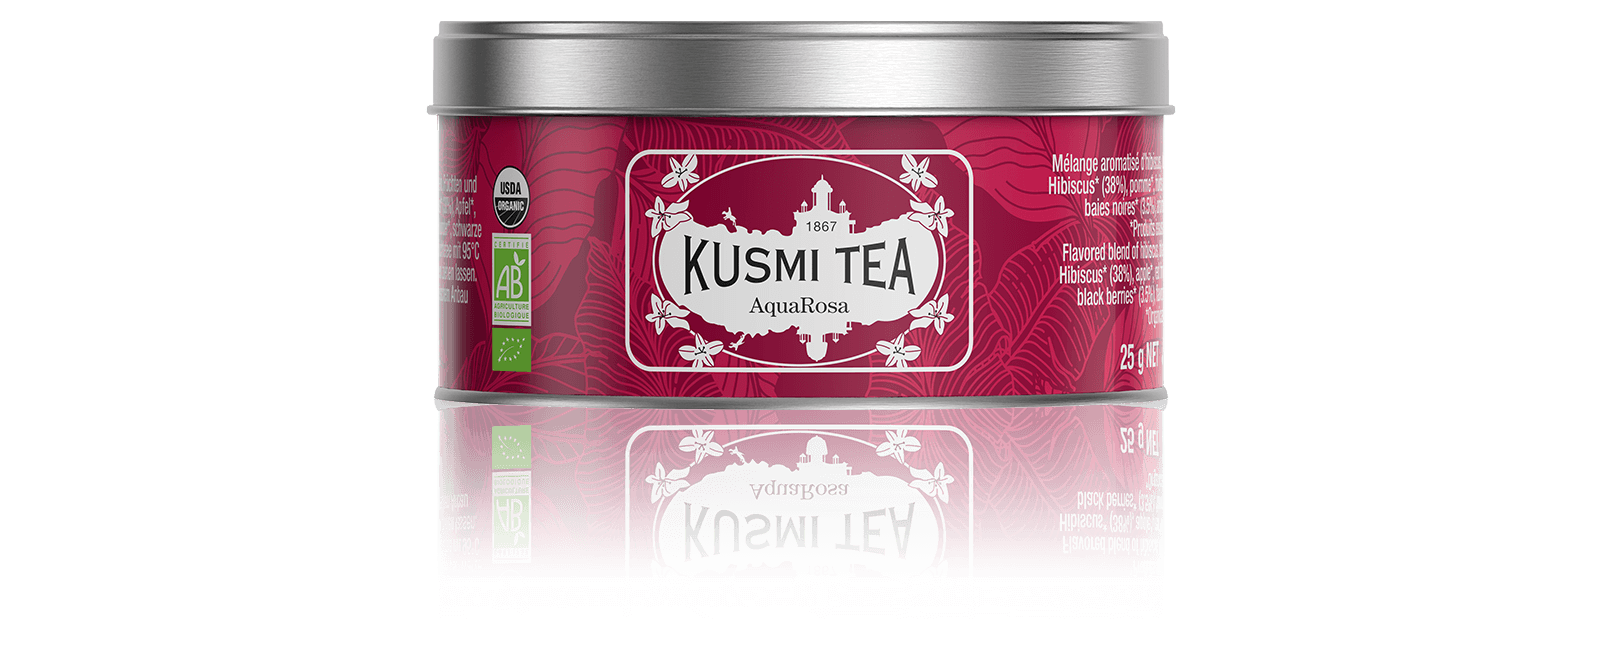 AquaRosa Infusion de fruits bio - Infusion hibiscus, fruits rouges - Boîte de thé en vrac - Kusmi Tea